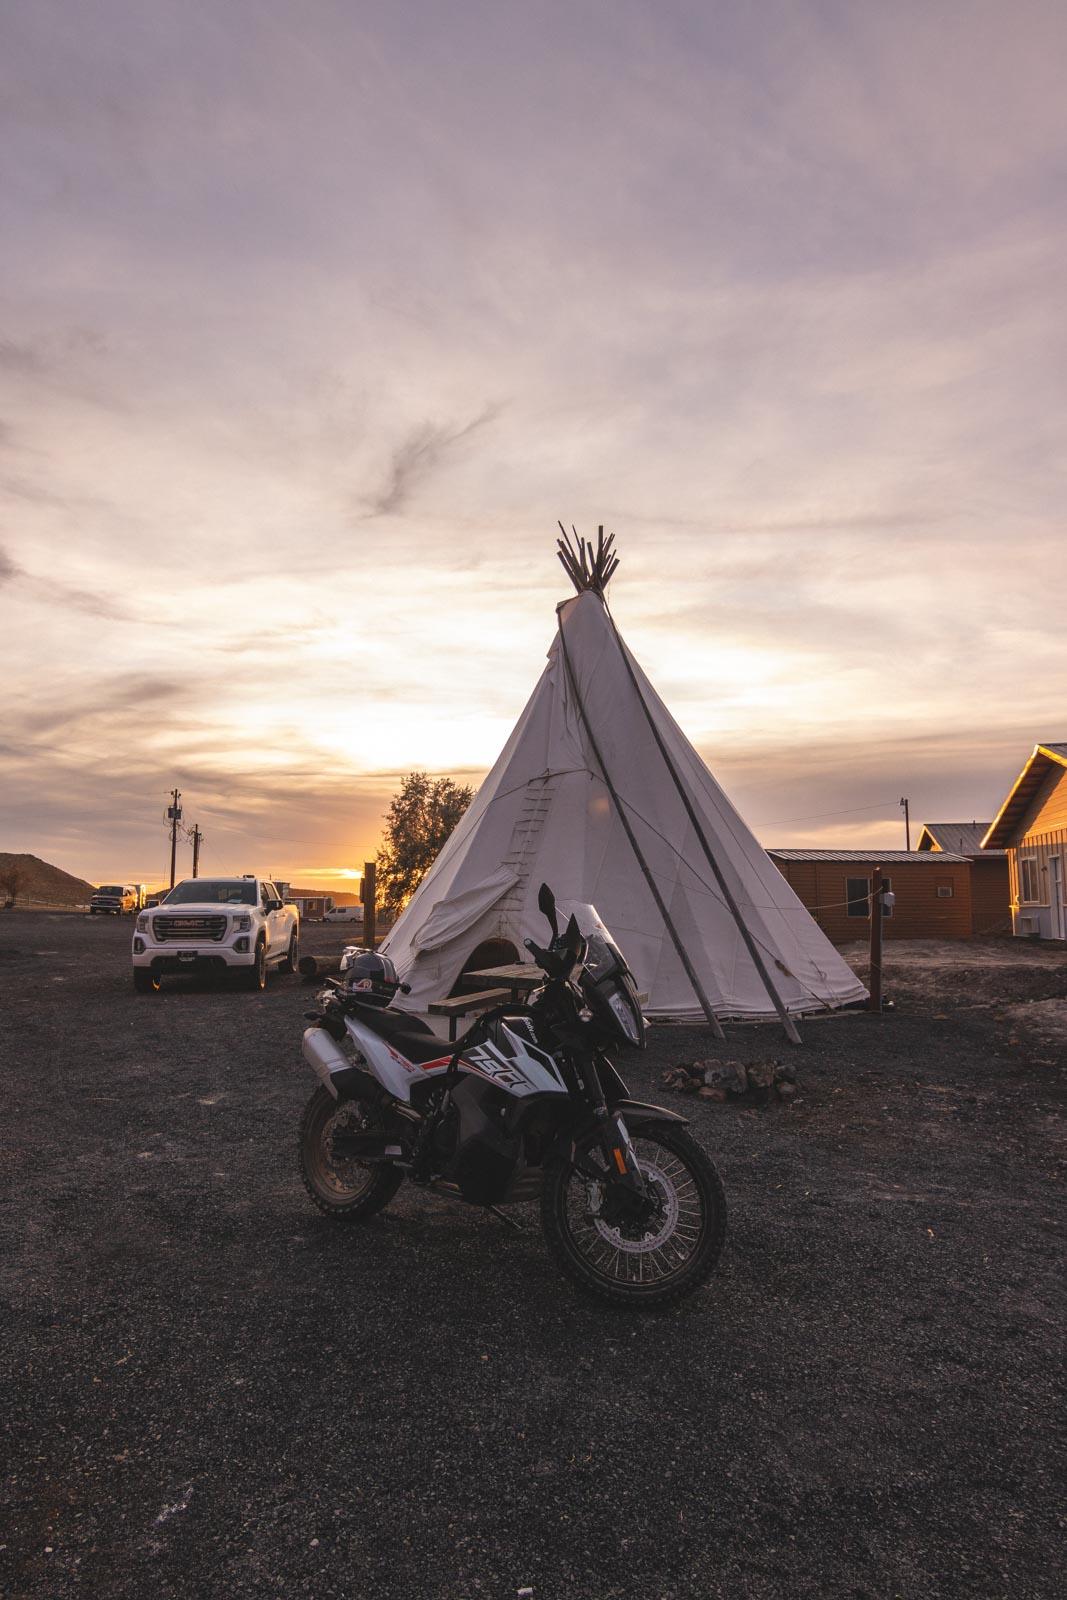 Sunset while camping at Crystal Crane Resort in Oregon